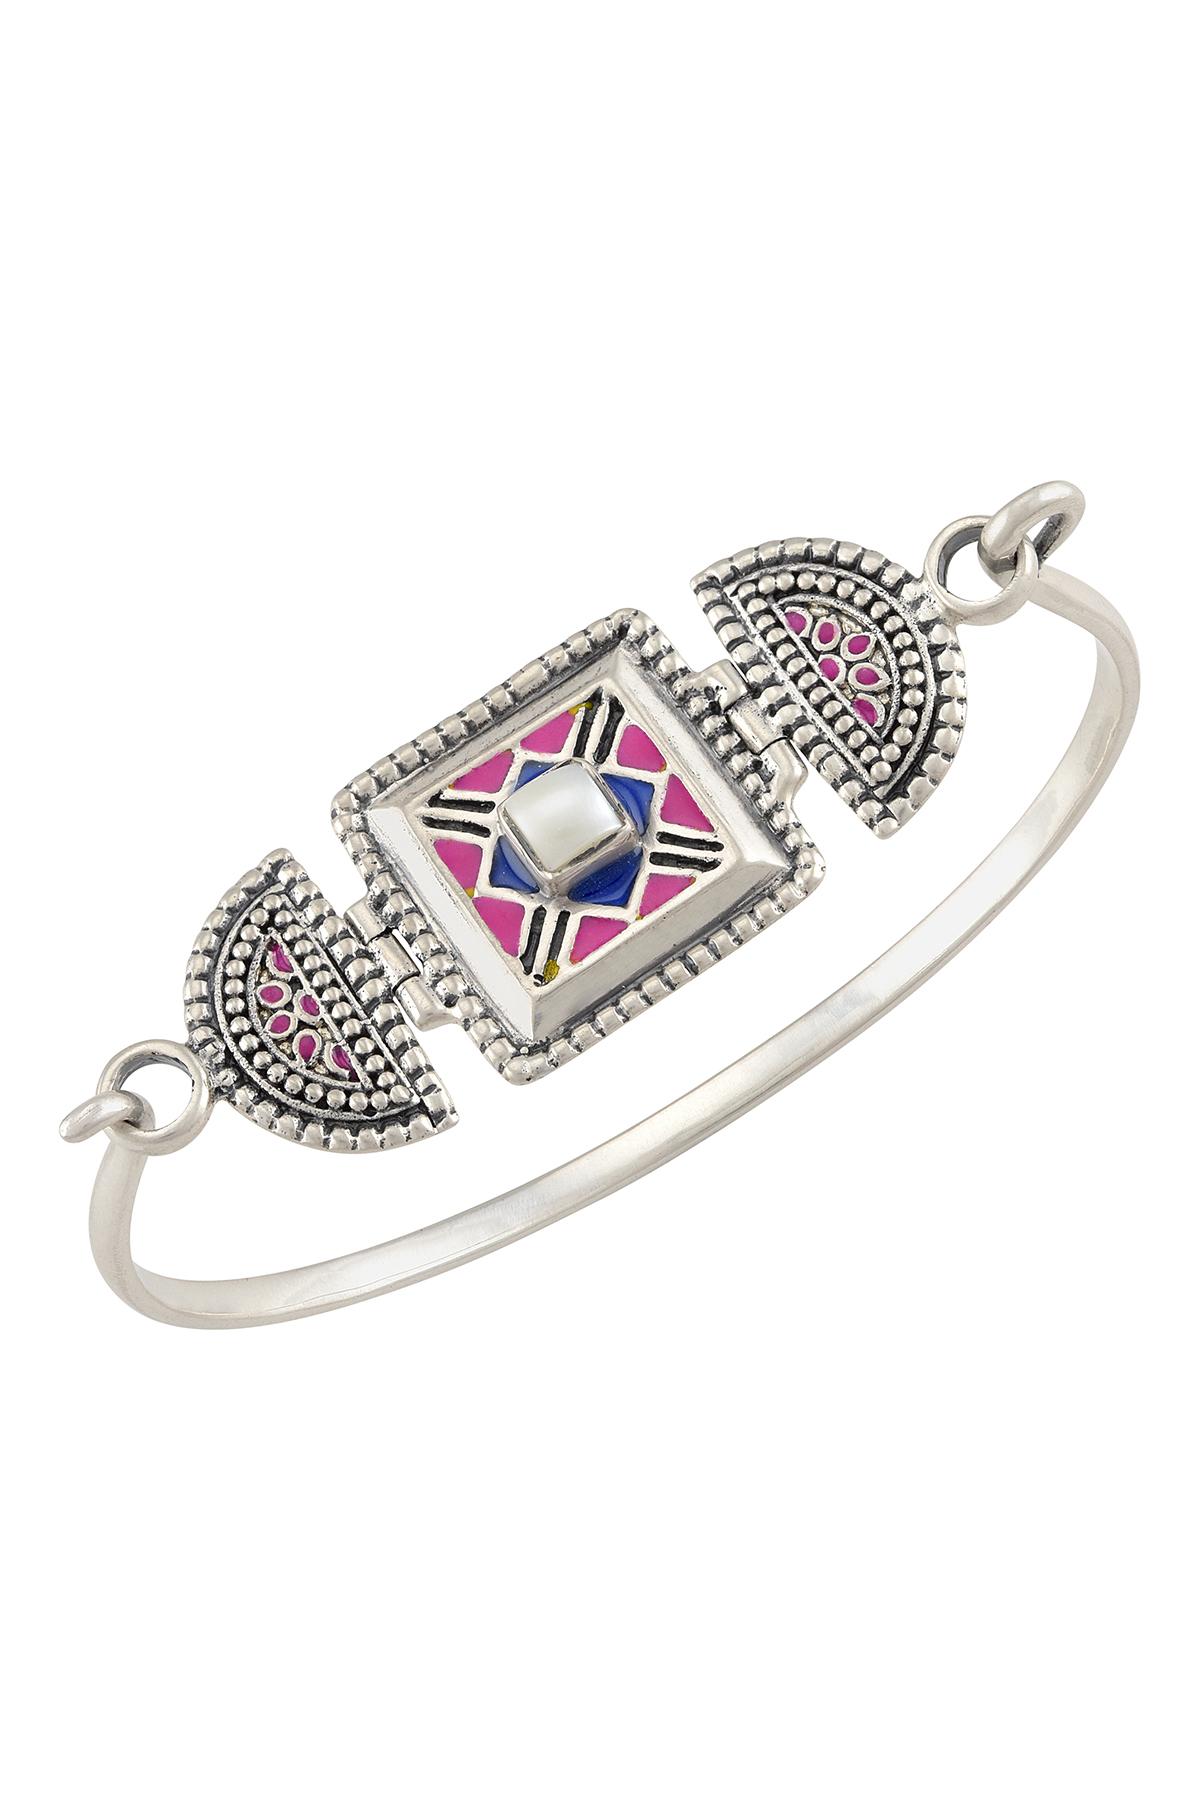 Color Pop Enameled Geometric Embellishment Bracelet